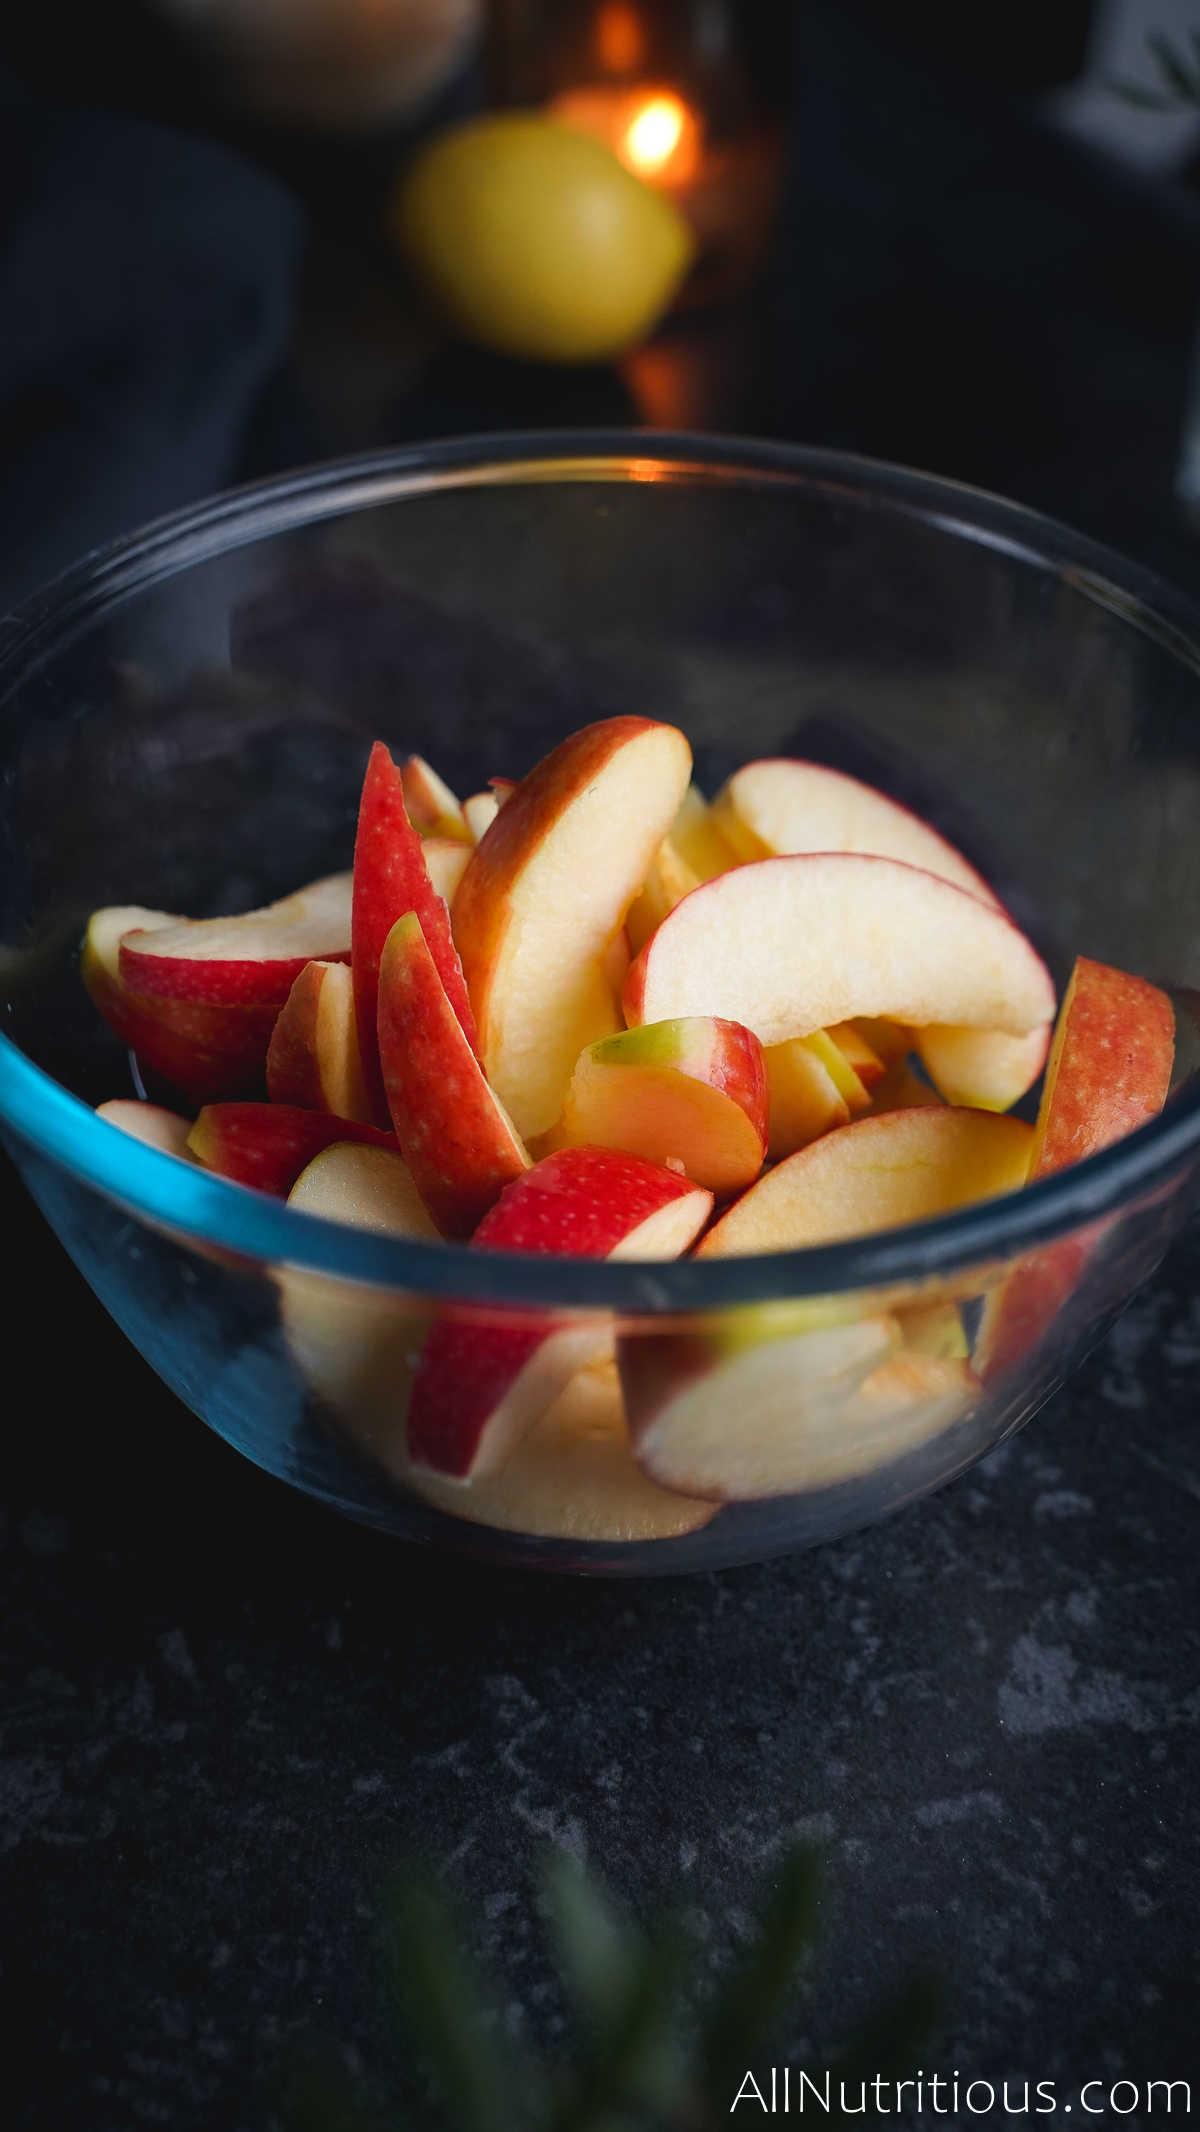 apple slices in bowl